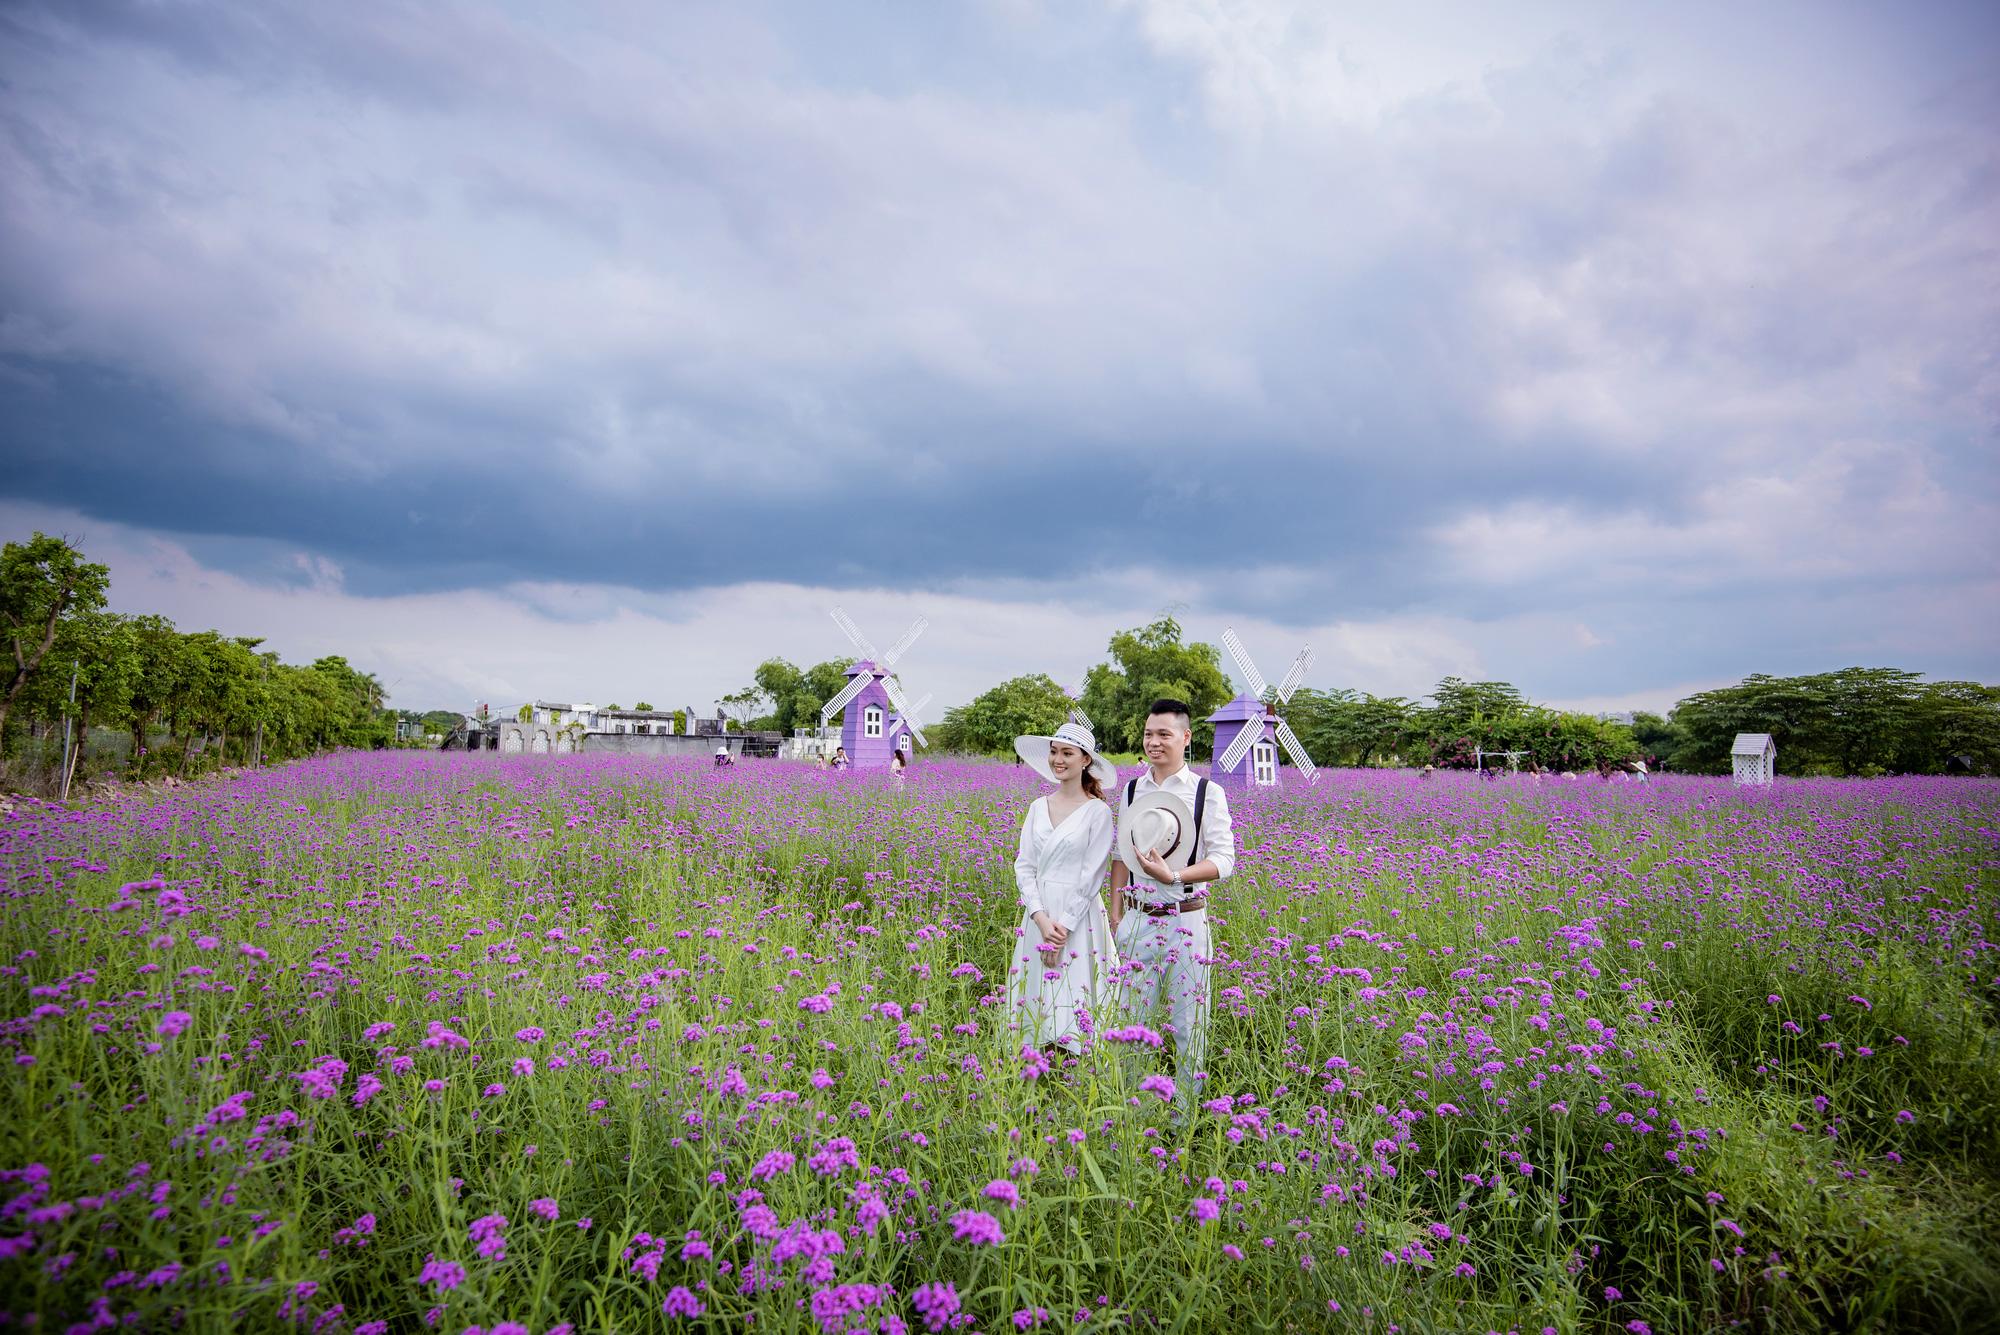 People visit a purpletop farm at the Long Bien flower plateau in Hanoi, Vietnam. Photo: Pham Tuan / Tuoi Tre